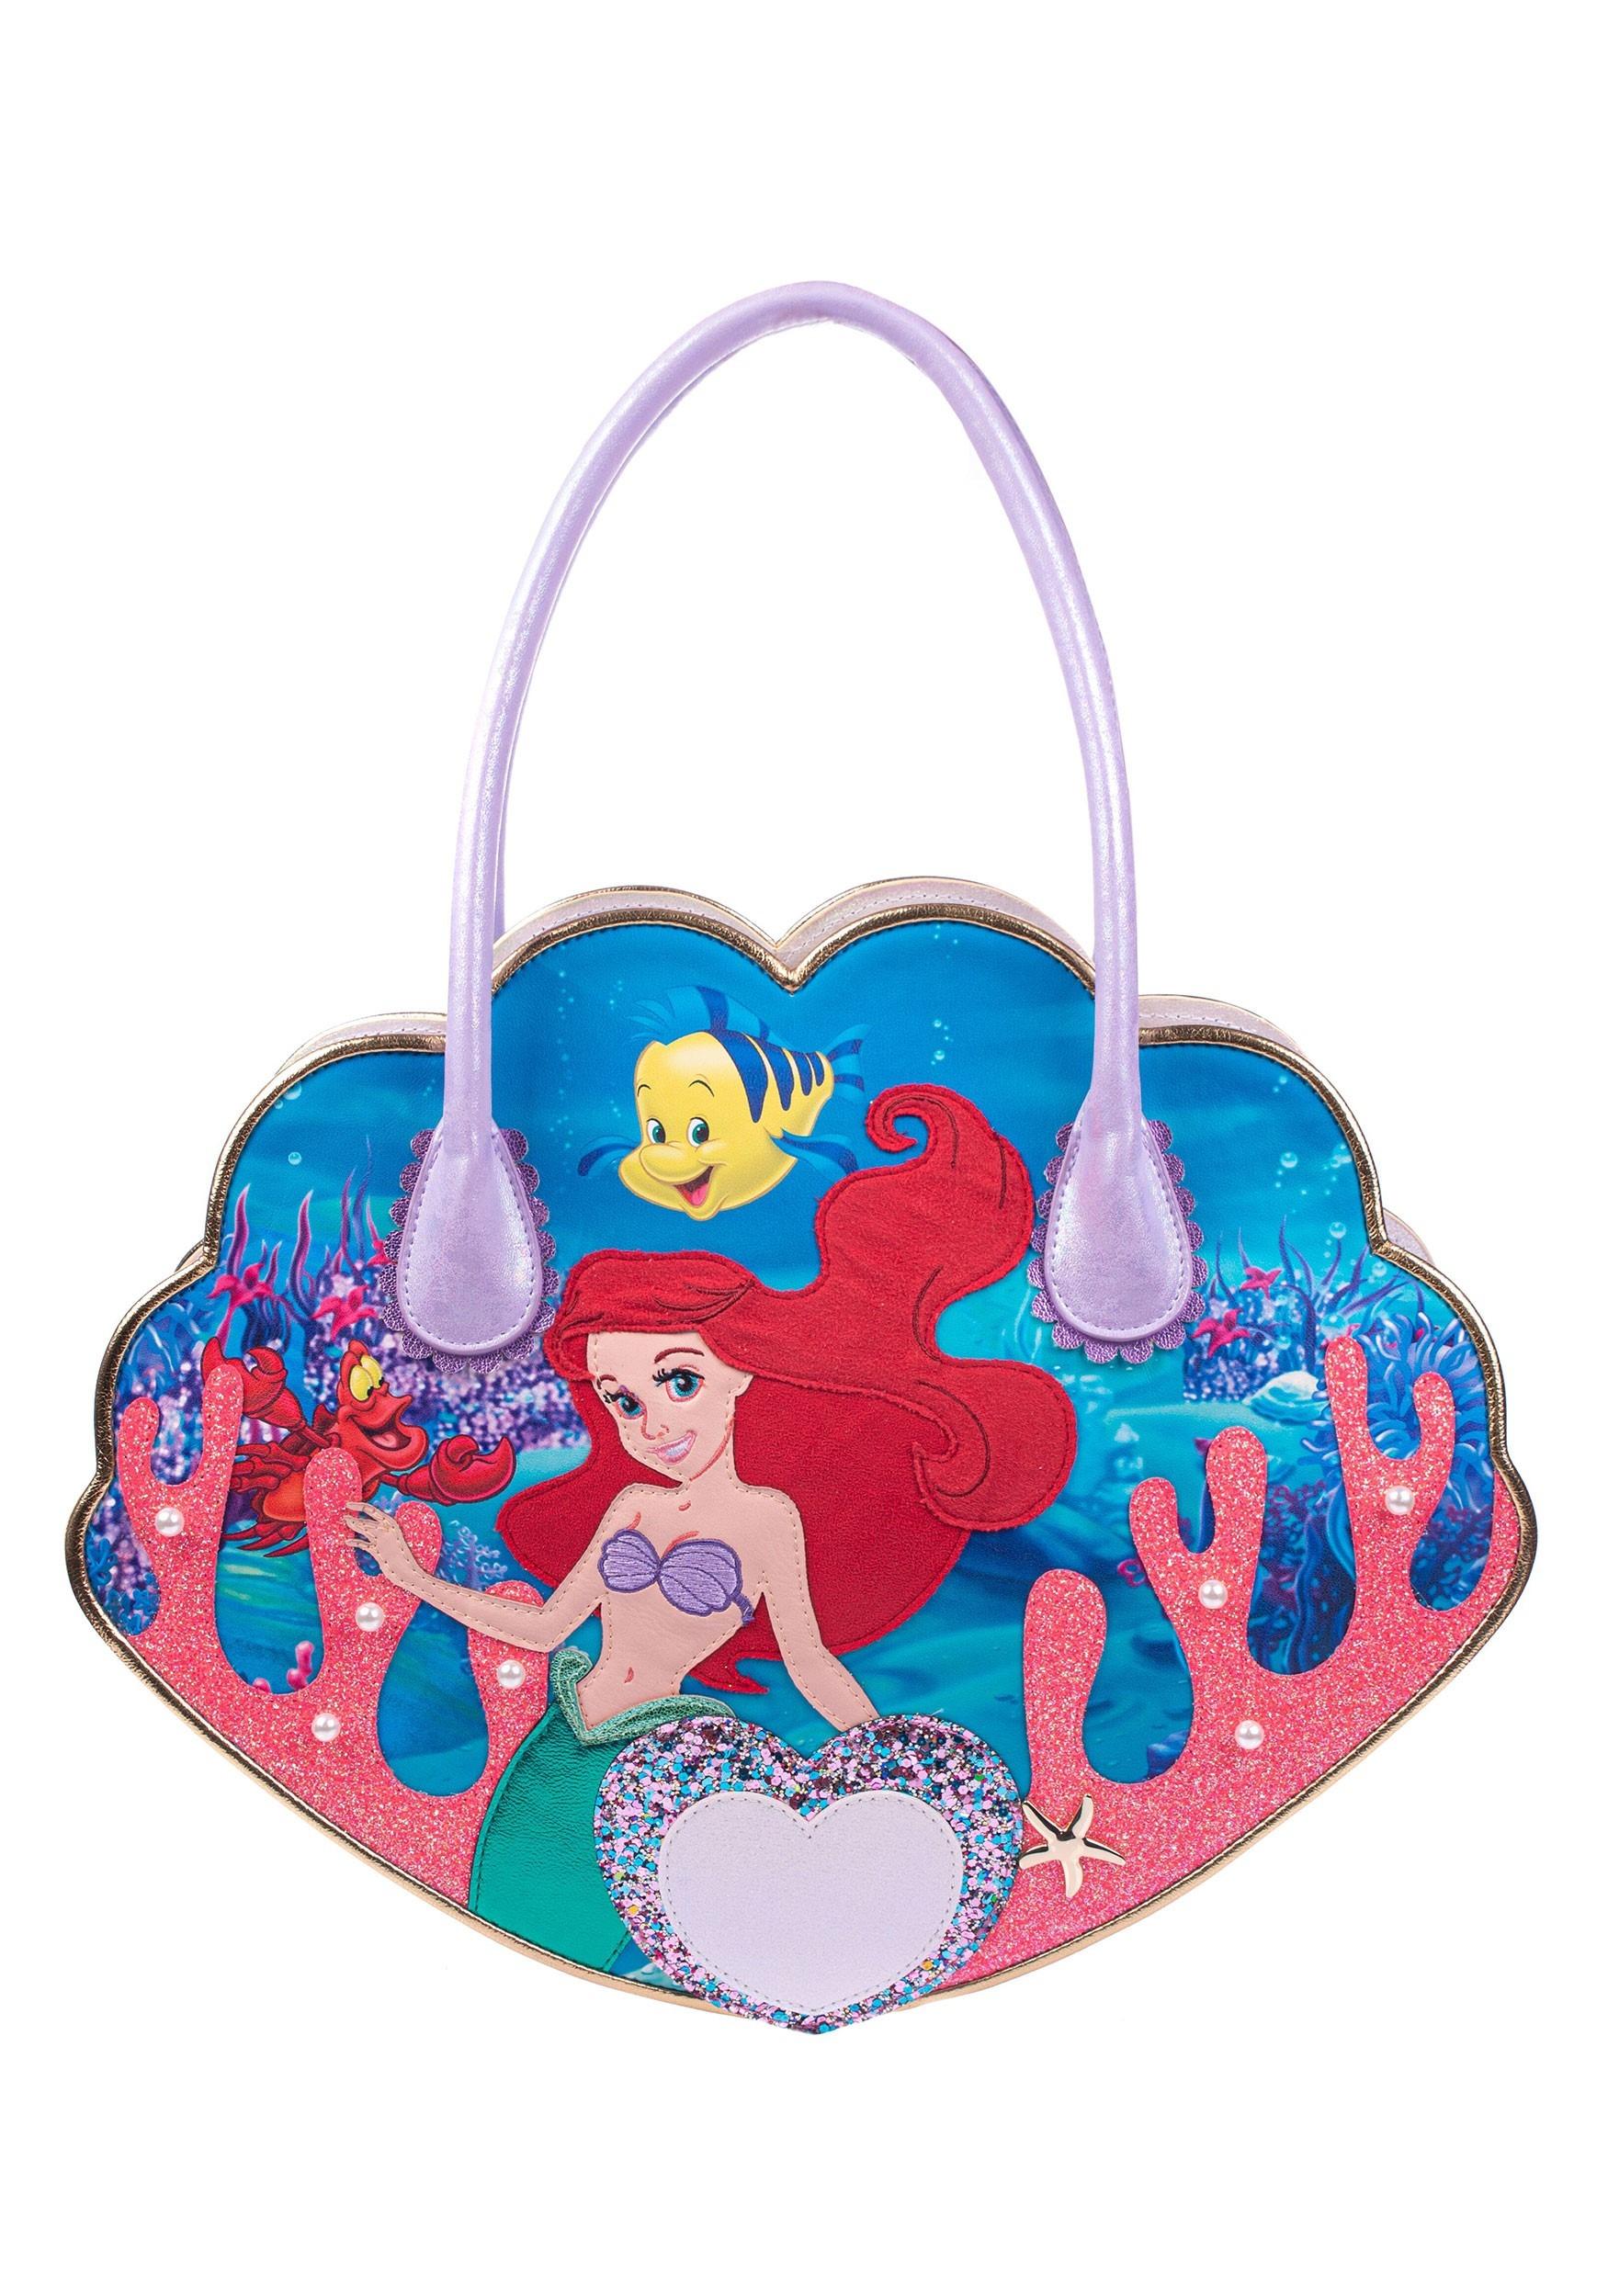 Little Mermaid Purse Irregular Choice